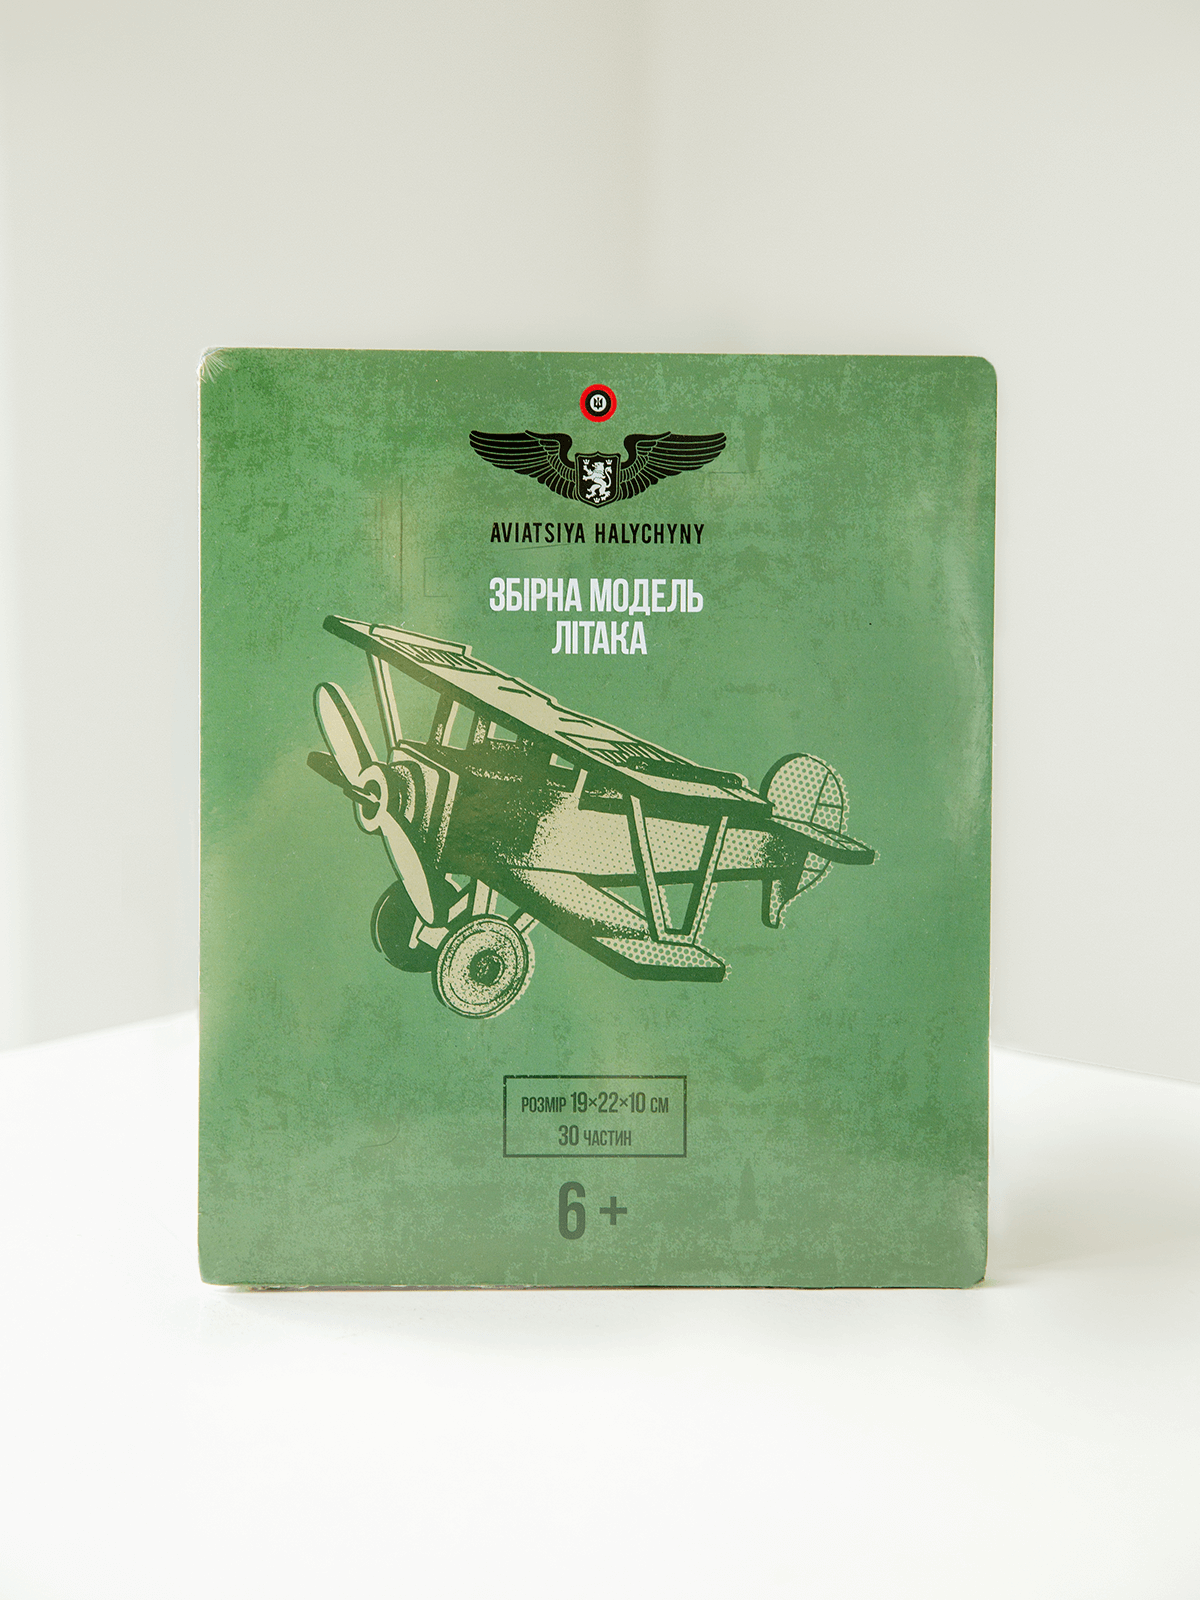 Wooden Constructor Plane. Color green. Size: 19 х 22 х 10 cm Material: wood.